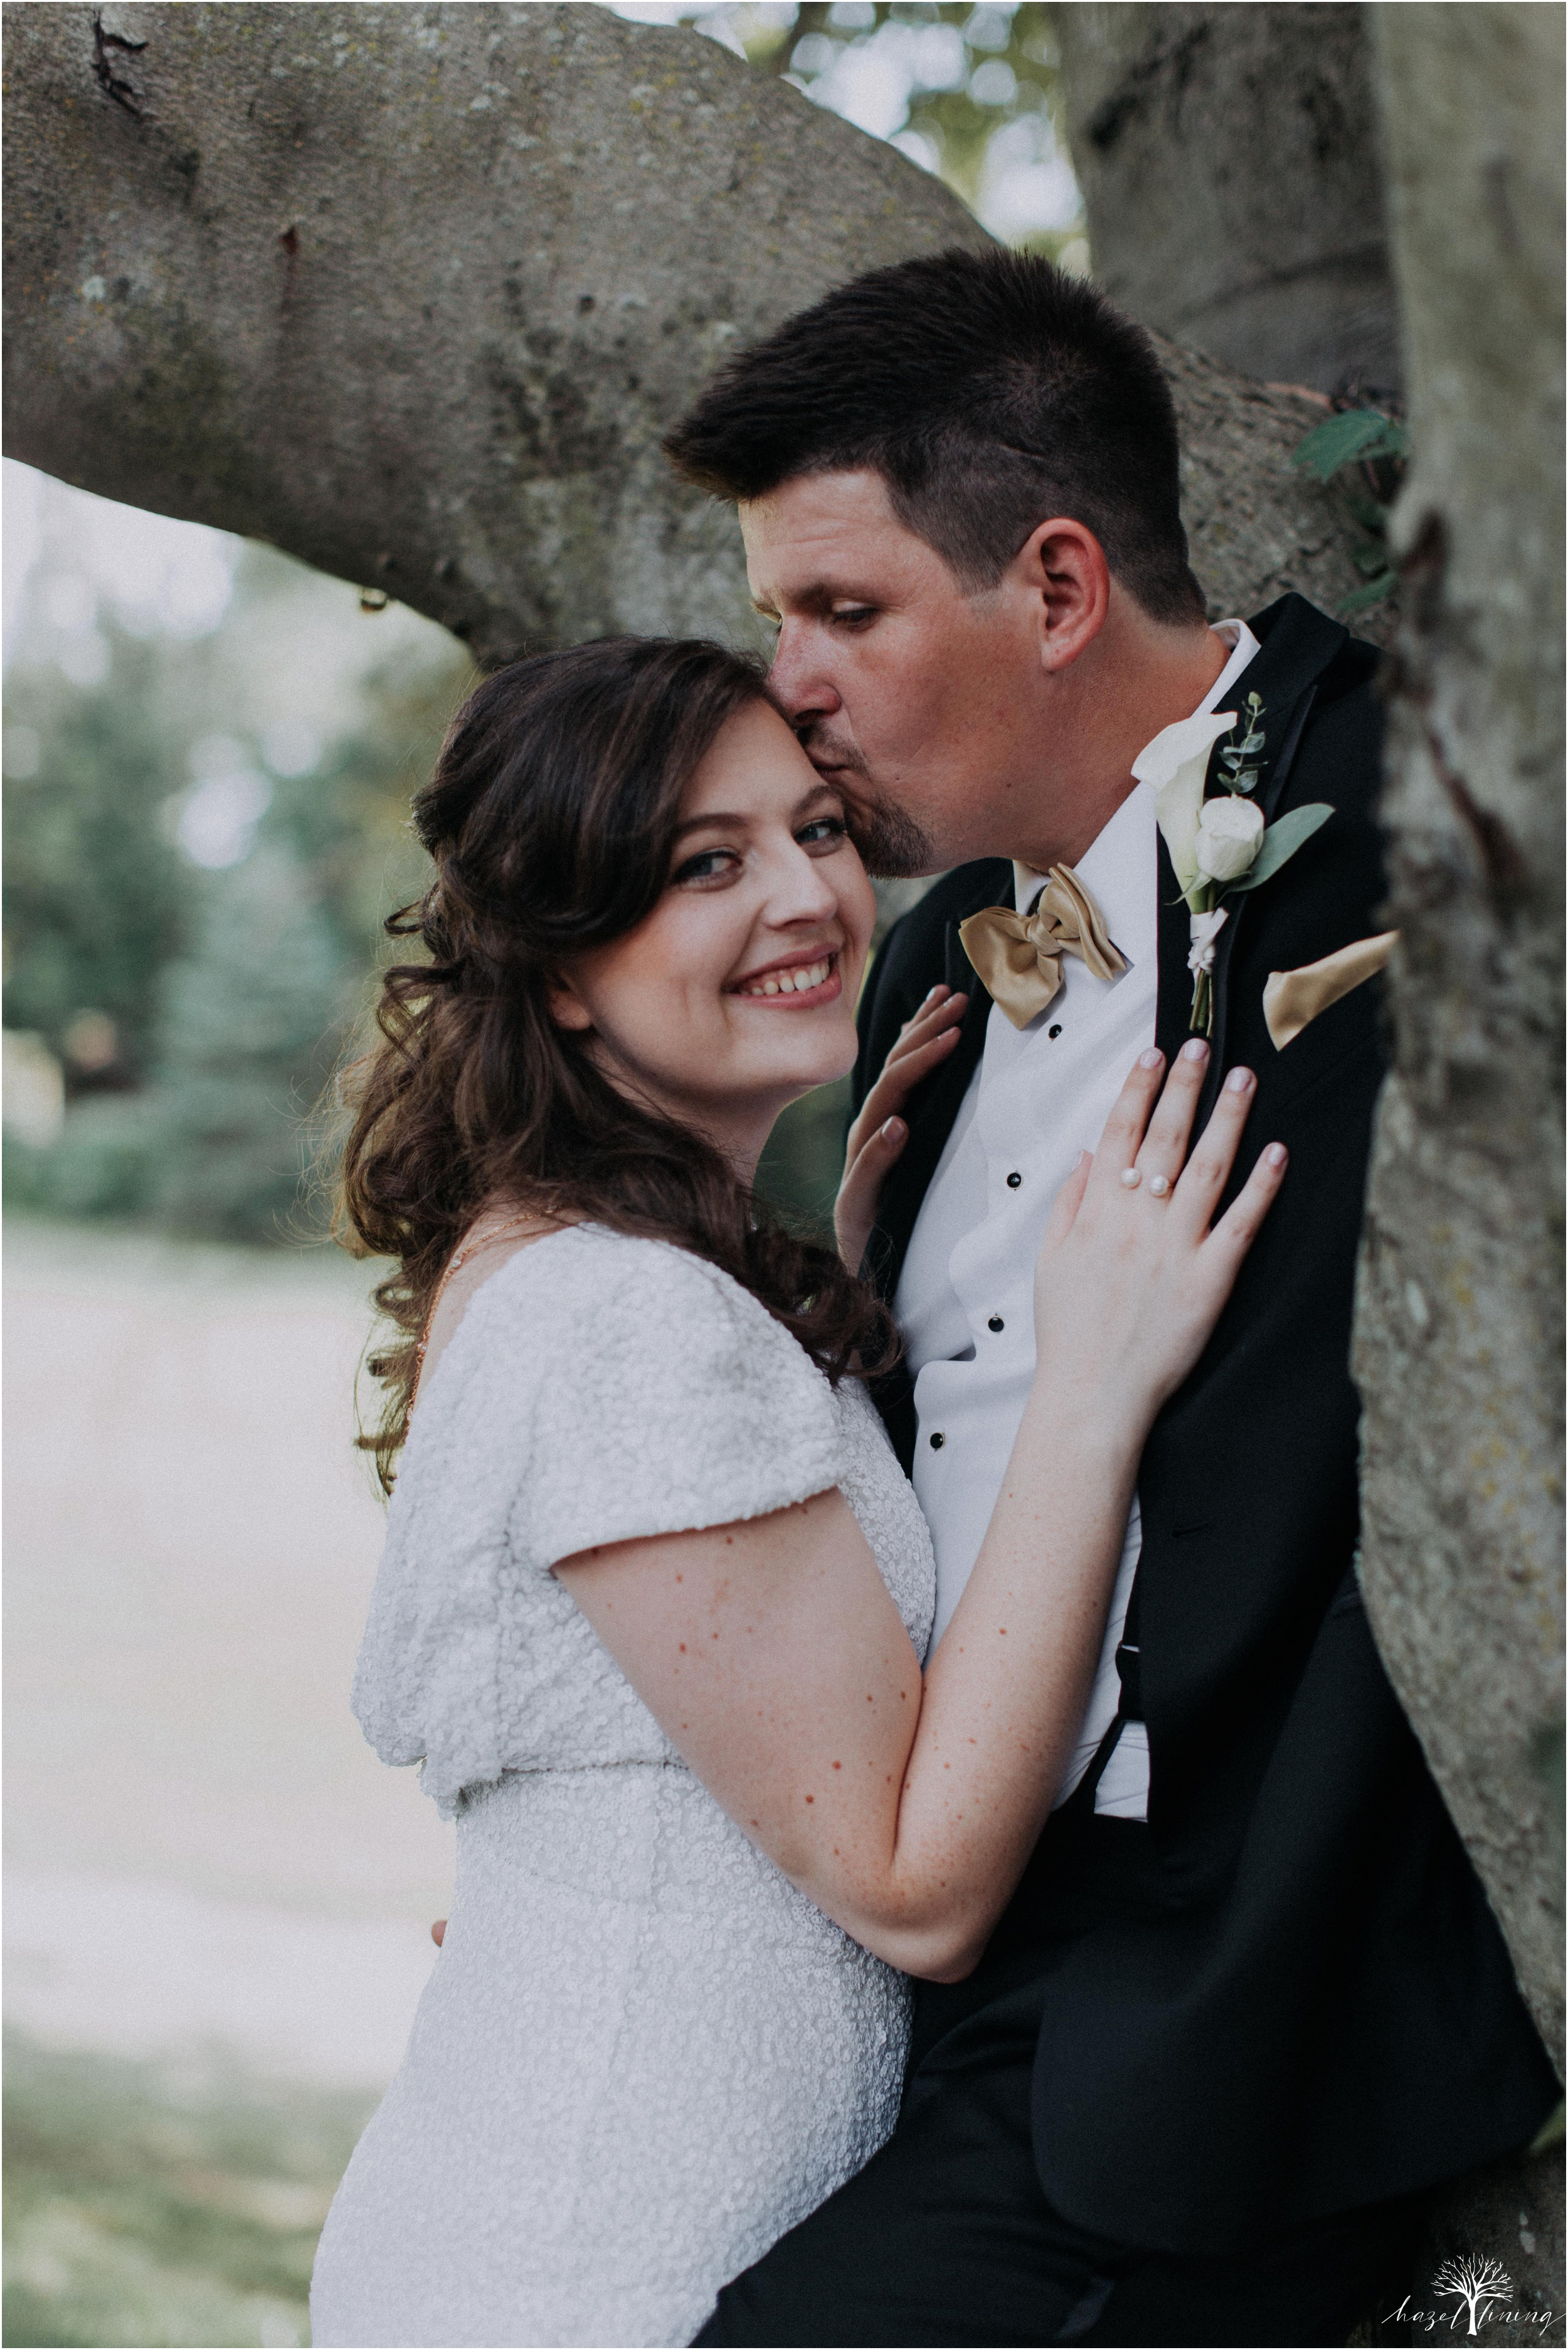 elizabeth-doelp-andrew-foreback-middletown-country-club-summer-langhorne-pennsylvania-wedding-hazel-lining-travel-wedding-elopement-photography_0096.jpg